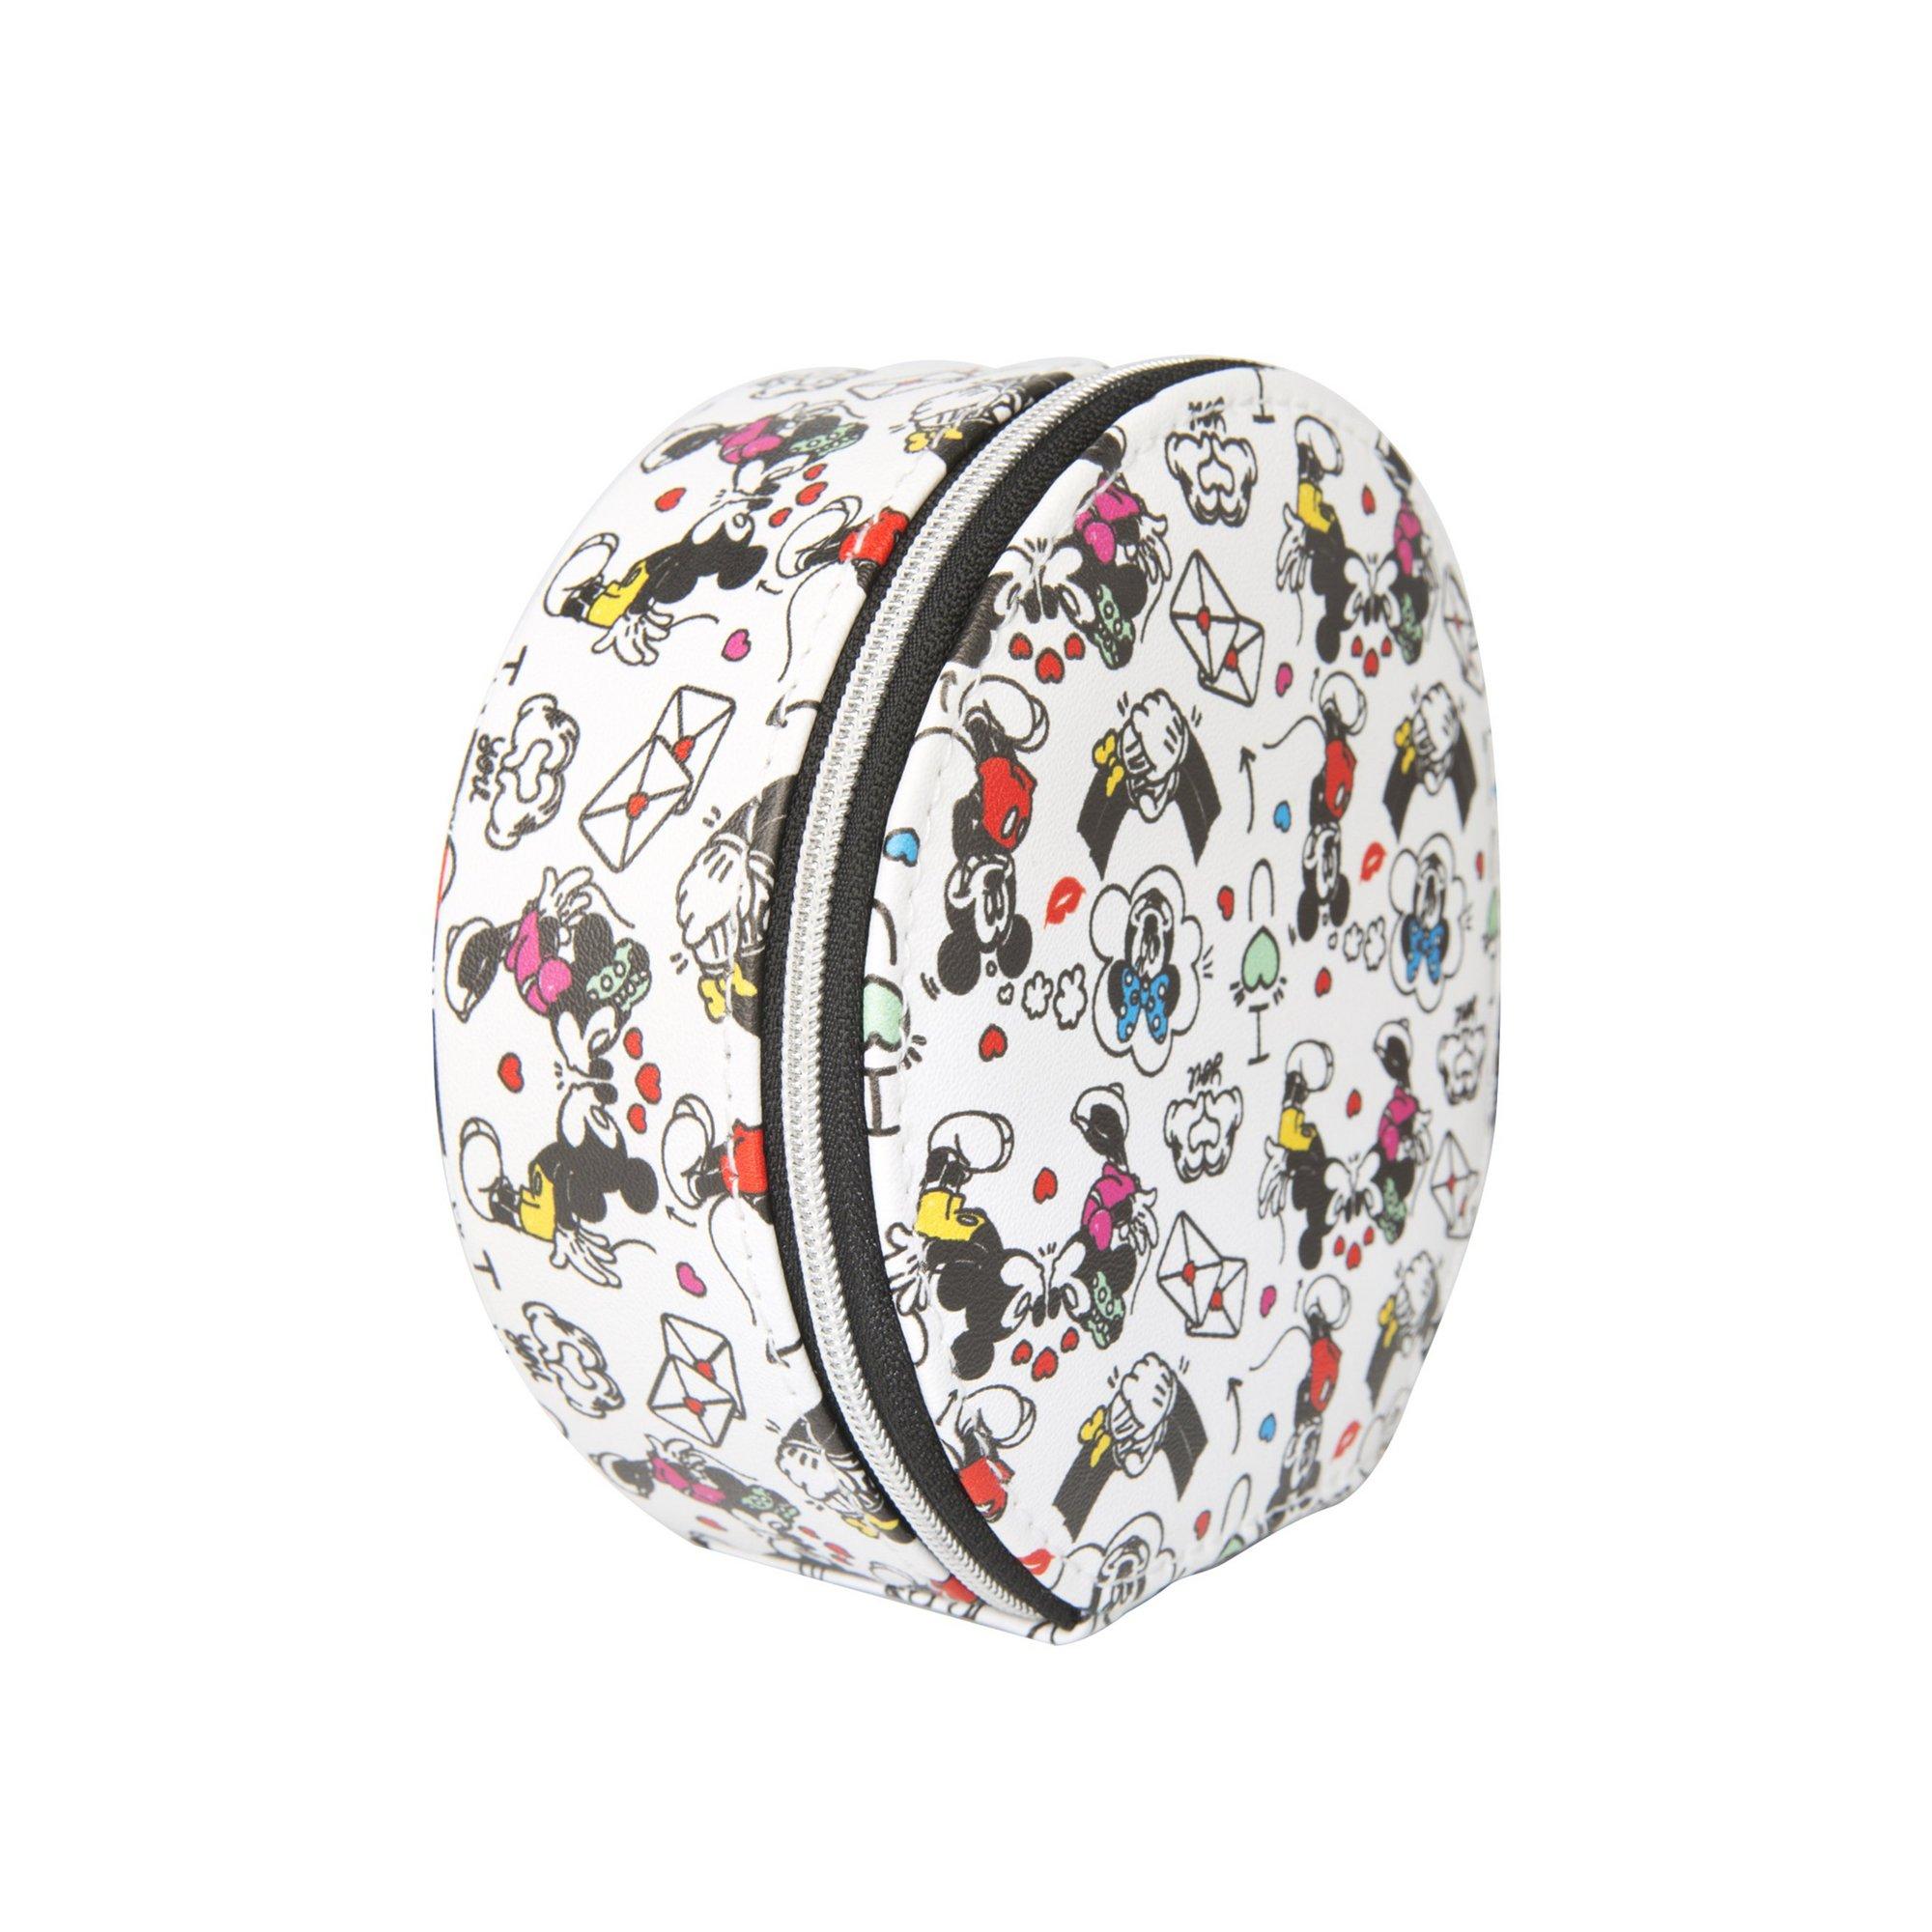 Image of Disney Mickey and Minnie Round Zip Around Jewellery Case